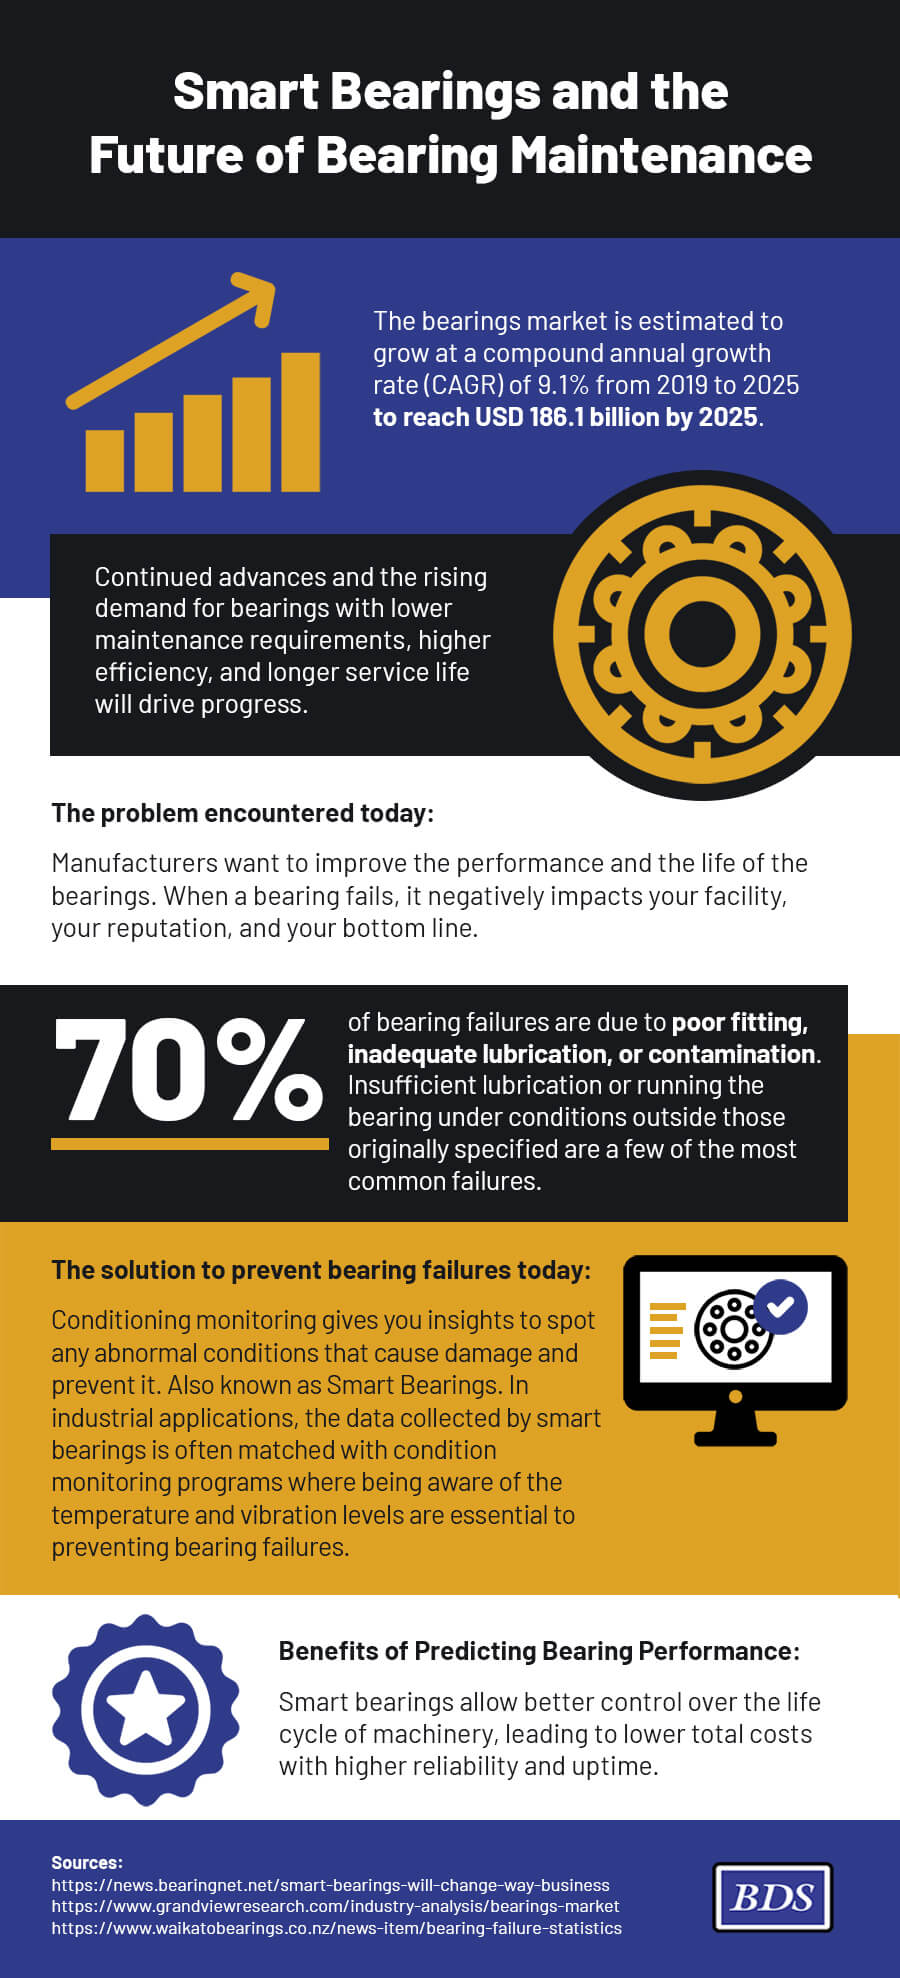 Smart Bearings and the Future of Bearing Maintenance